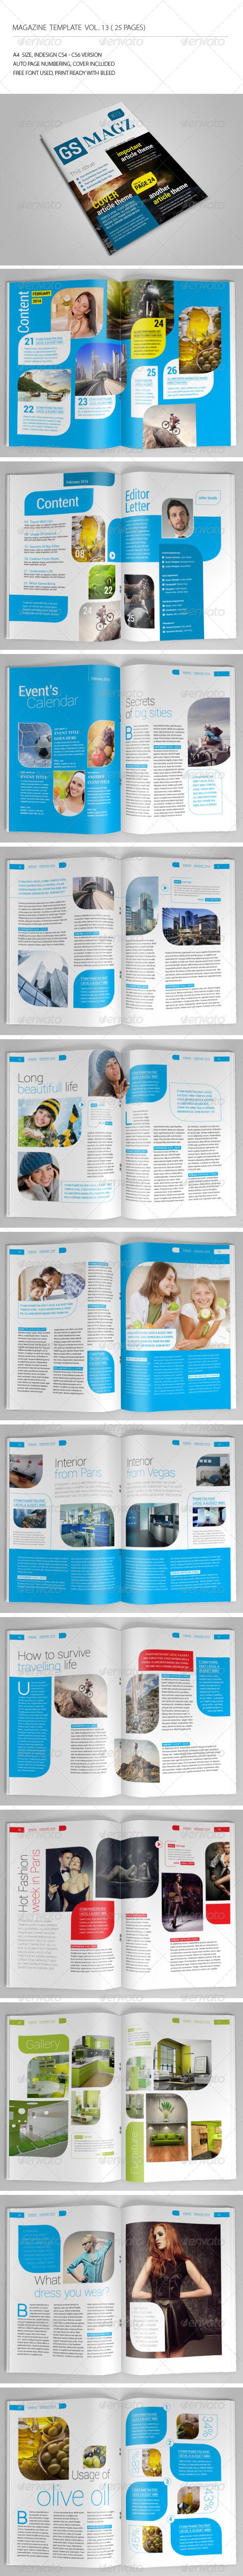 25 Pages Clean Magazine Vol13 - Magazines Print Templates